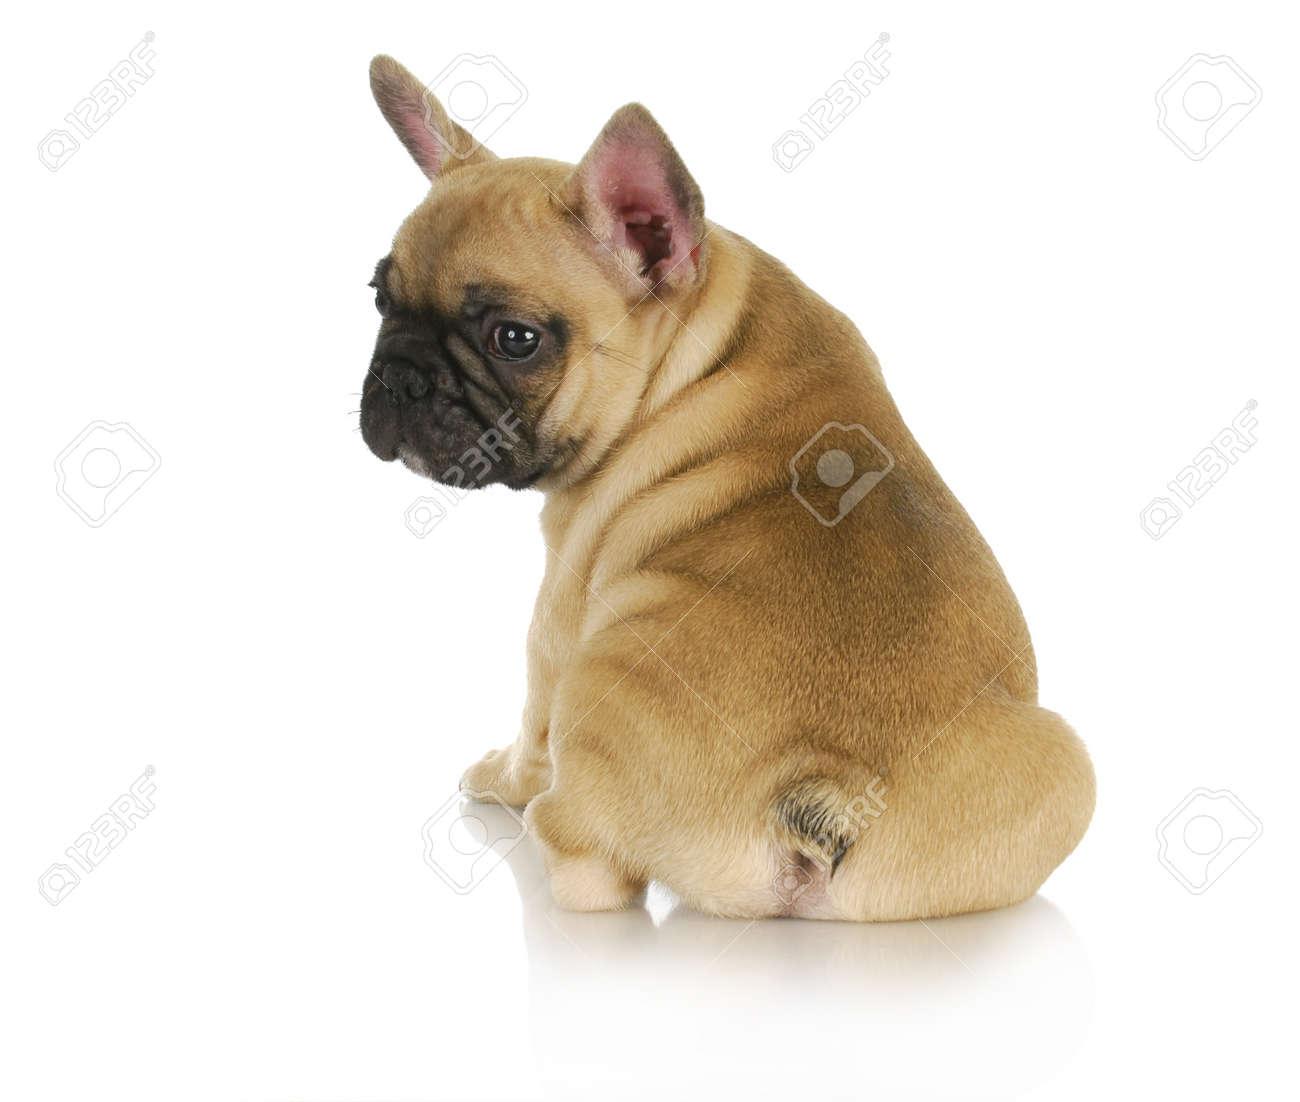 Cute puppy french bulldog puppy sitting looking over shoulder cute puppy french bulldog puppy sitting looking over shoulder on white background 8 weeks nvjuhfo Choice Image